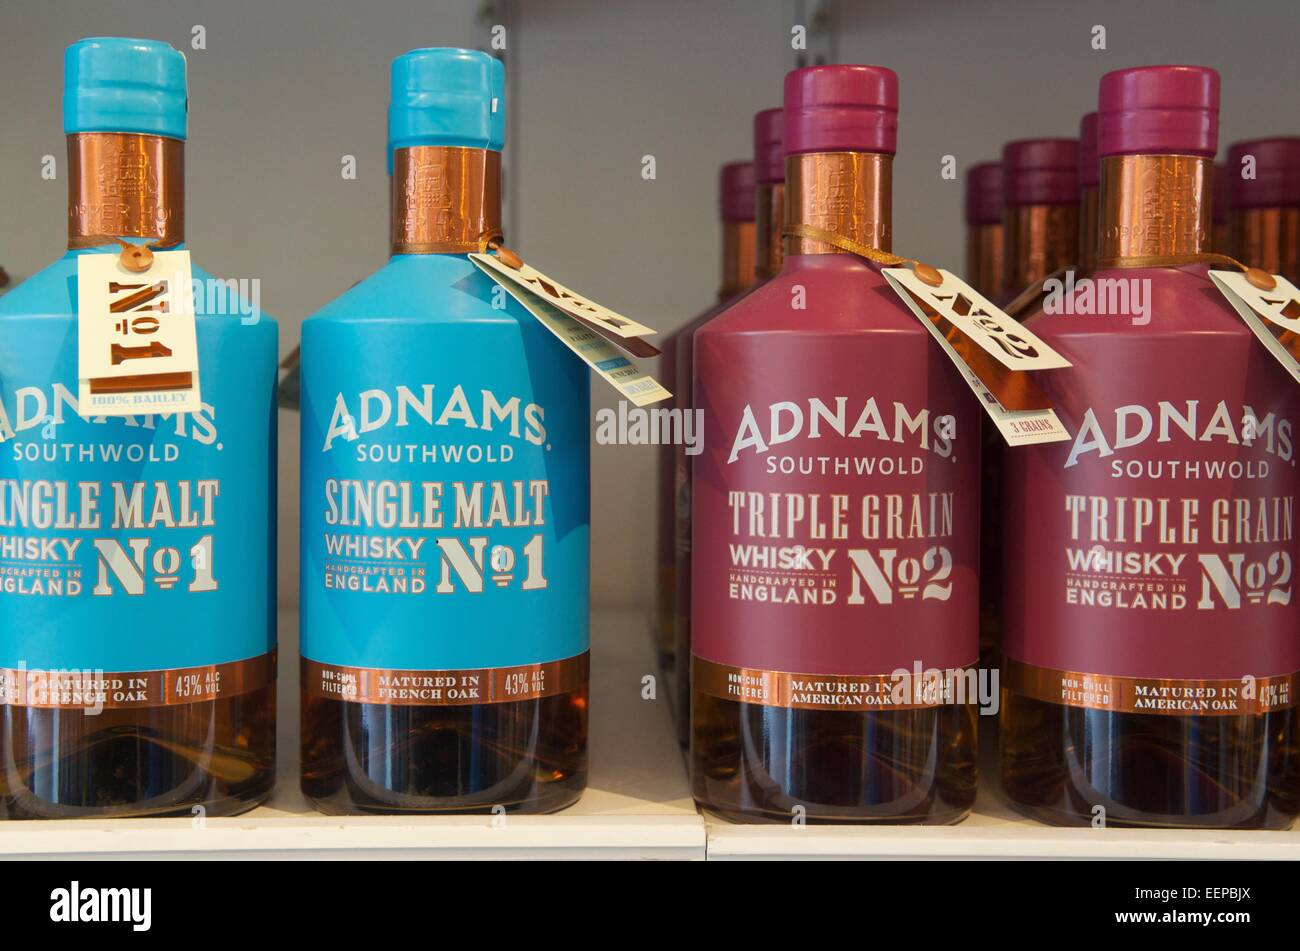 Malt Grain Stockfotos & Malt Grain Bilder - Seite 3 - Alamy